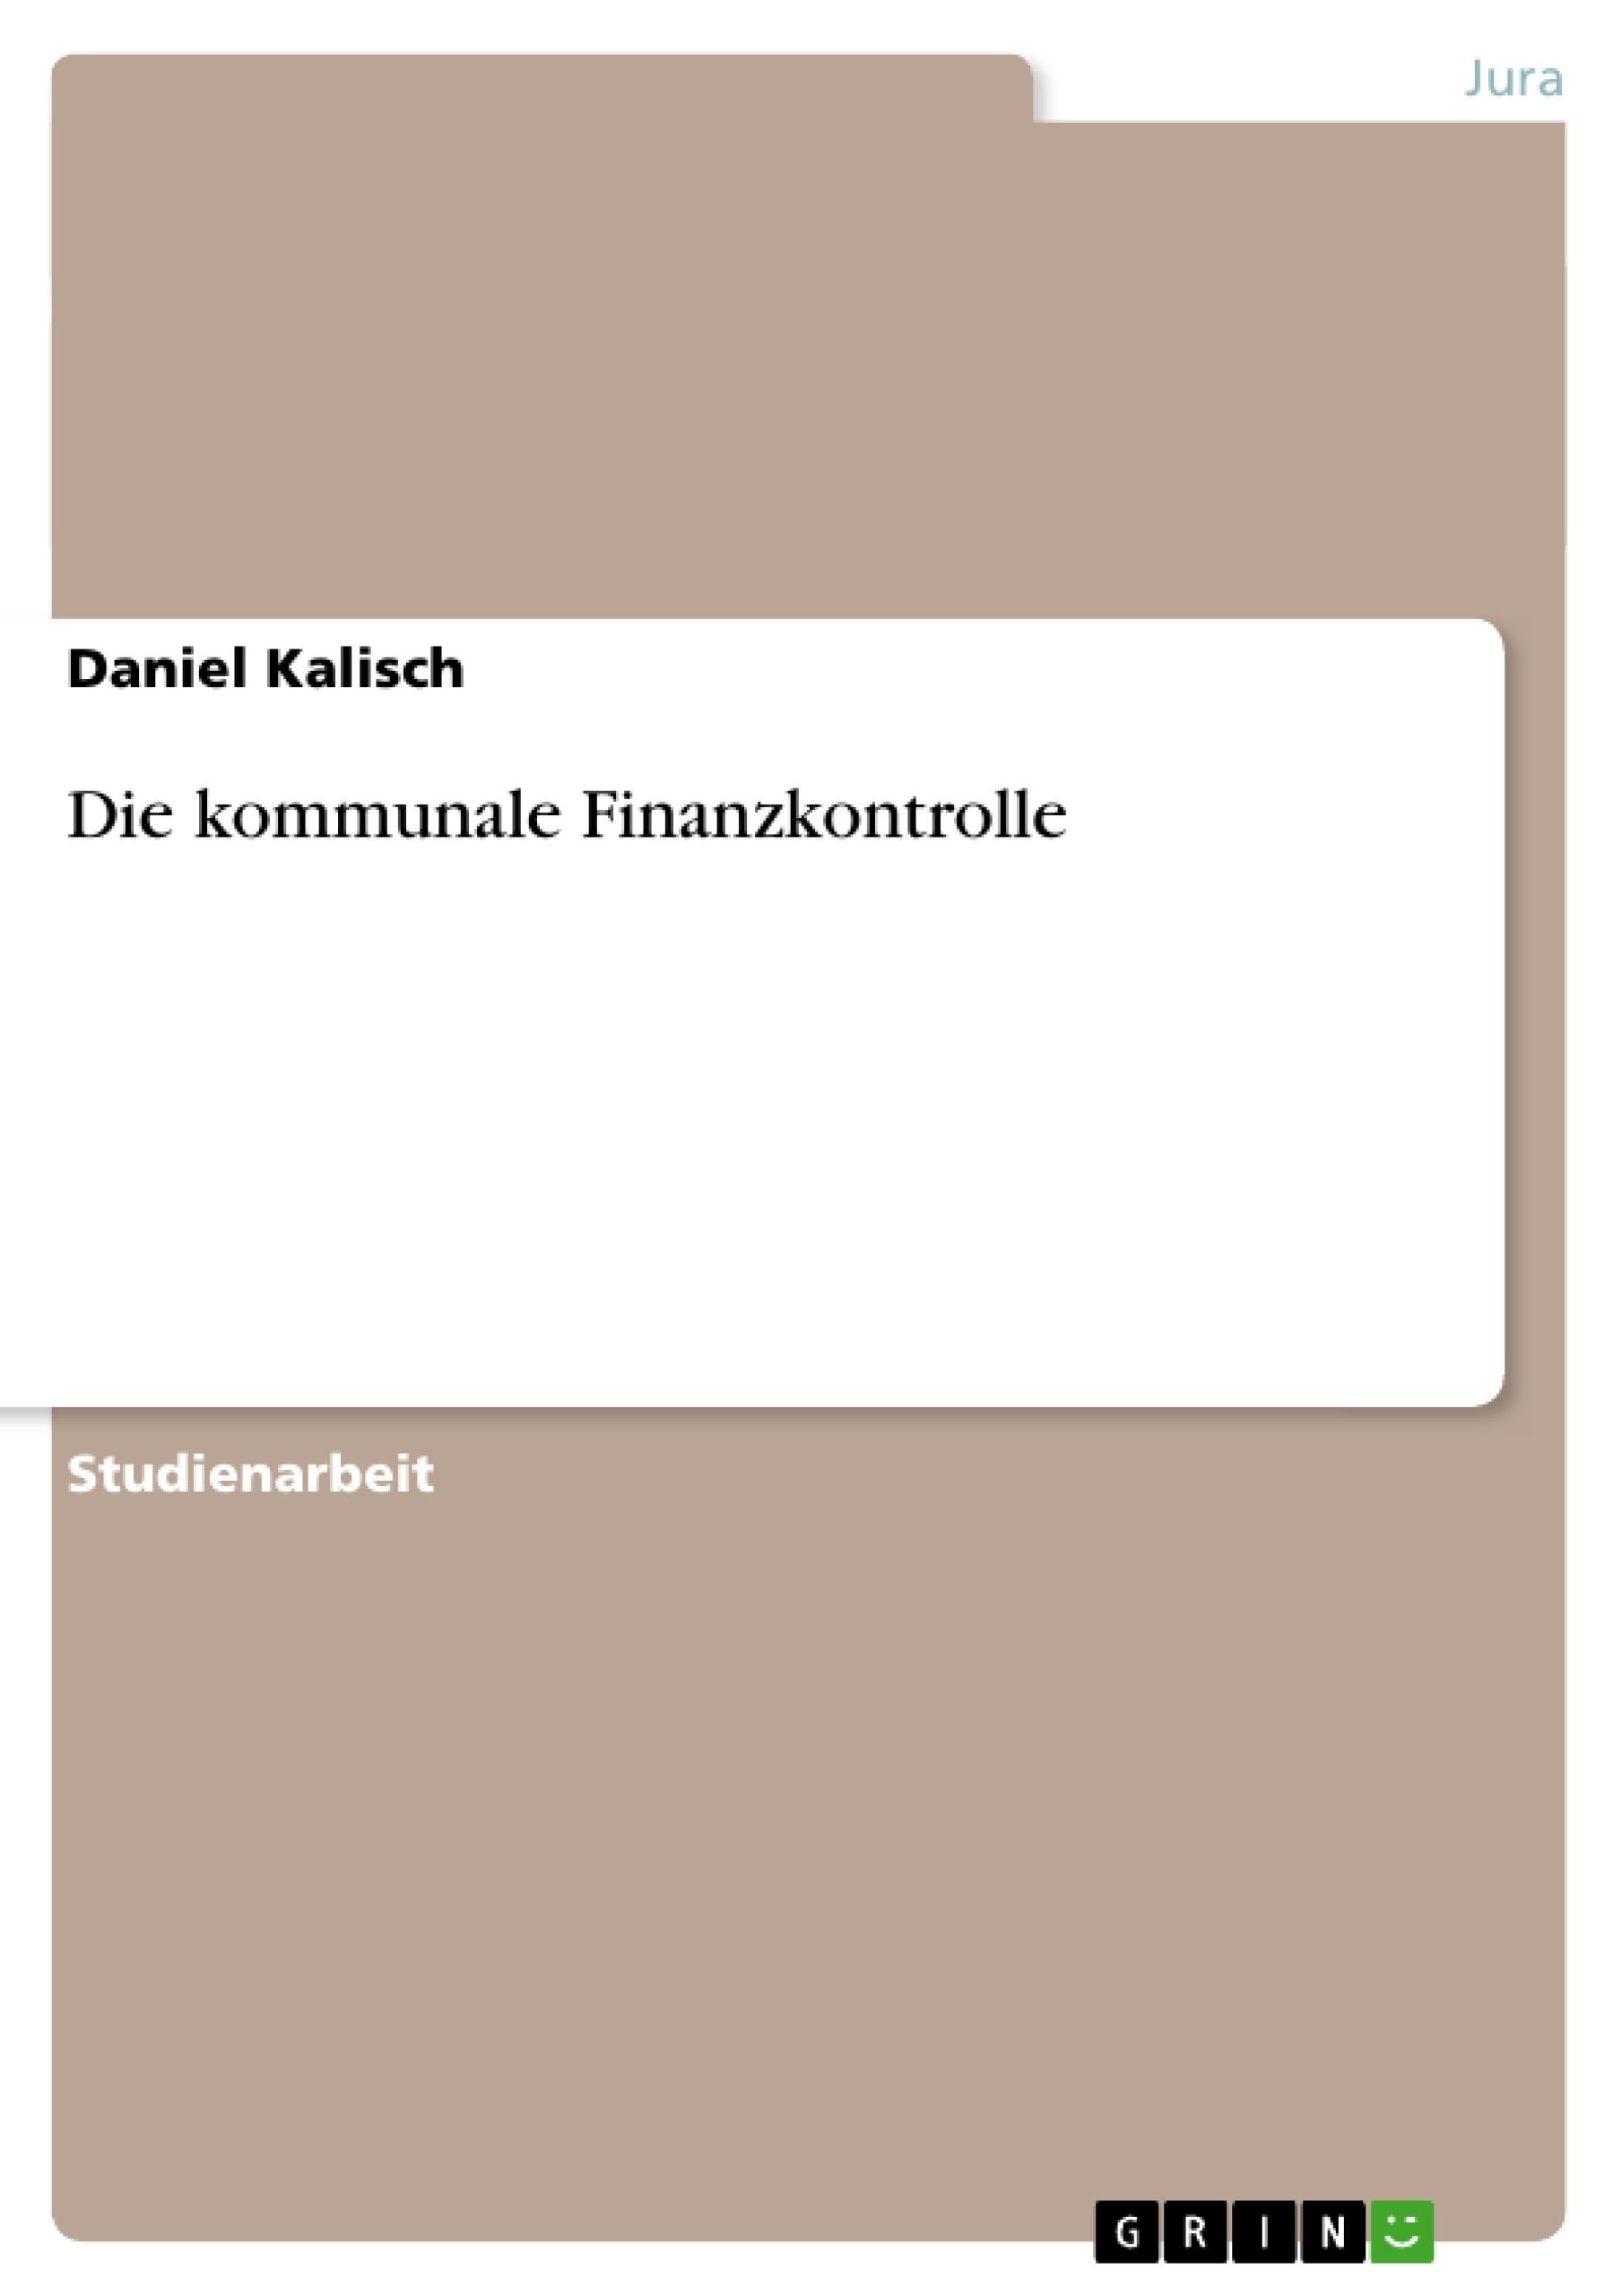 Titel: Die kommunale Finanzkontrolle